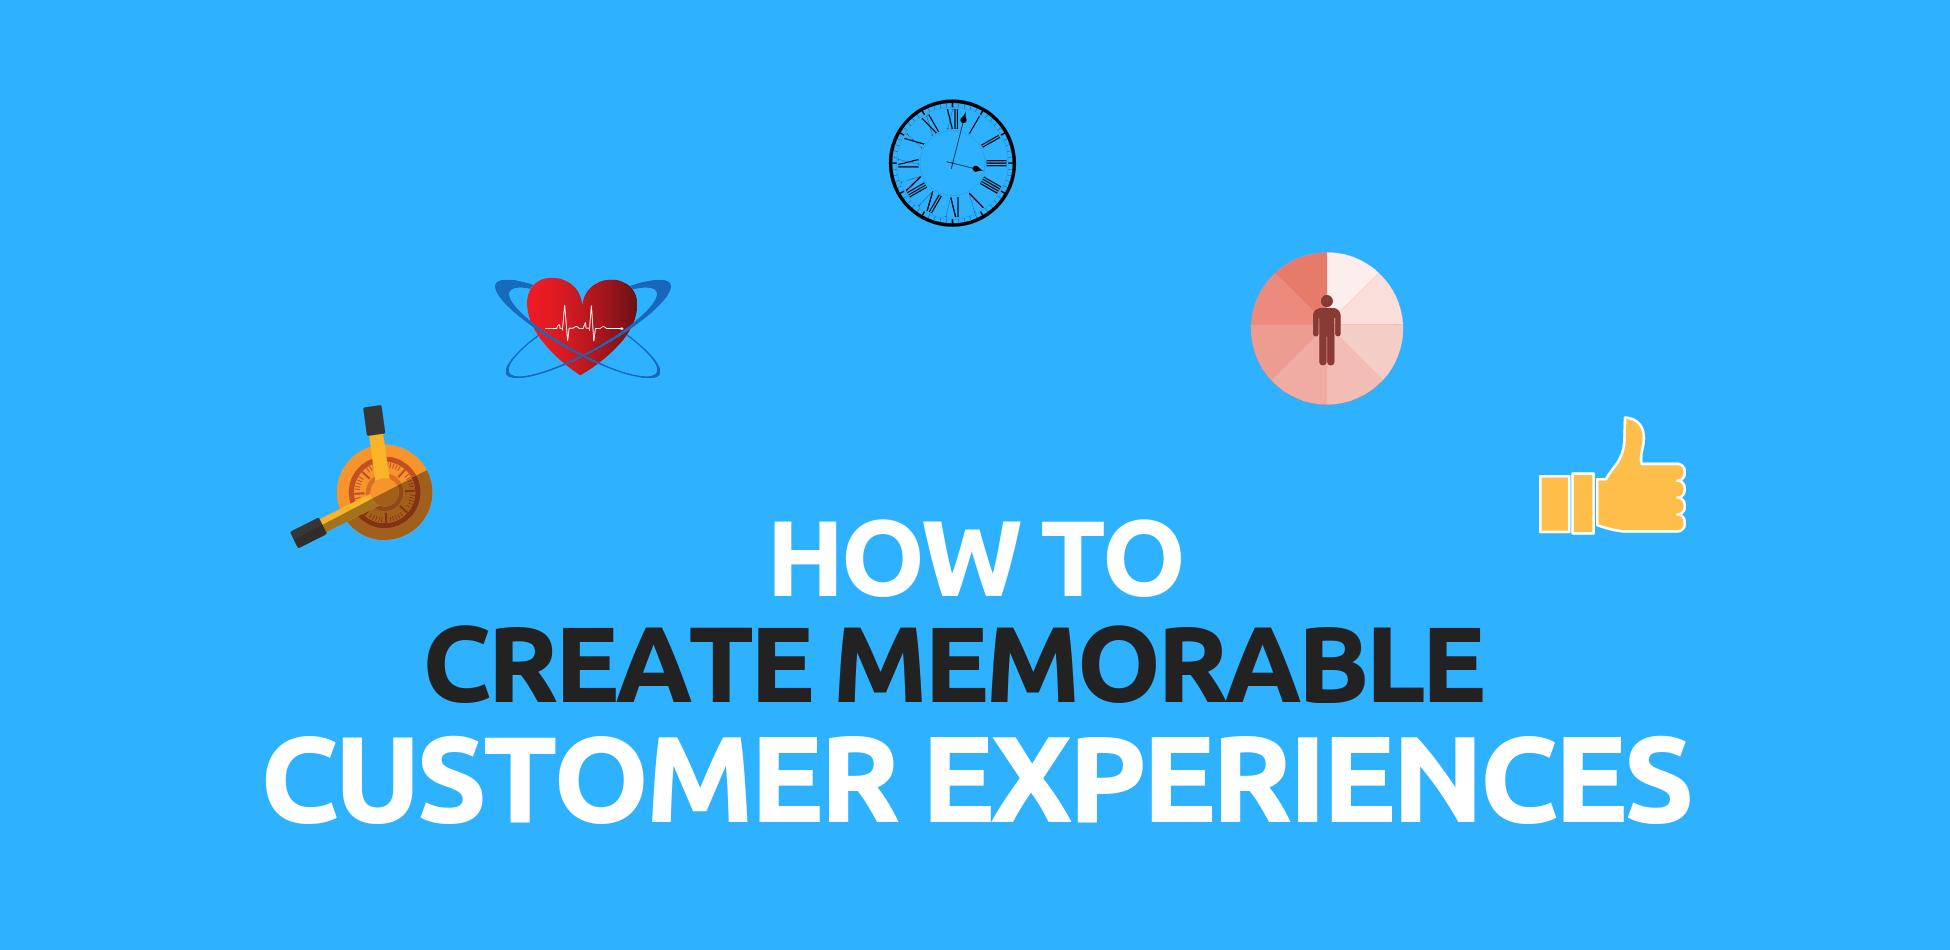 Creating Memorable Customer Experience